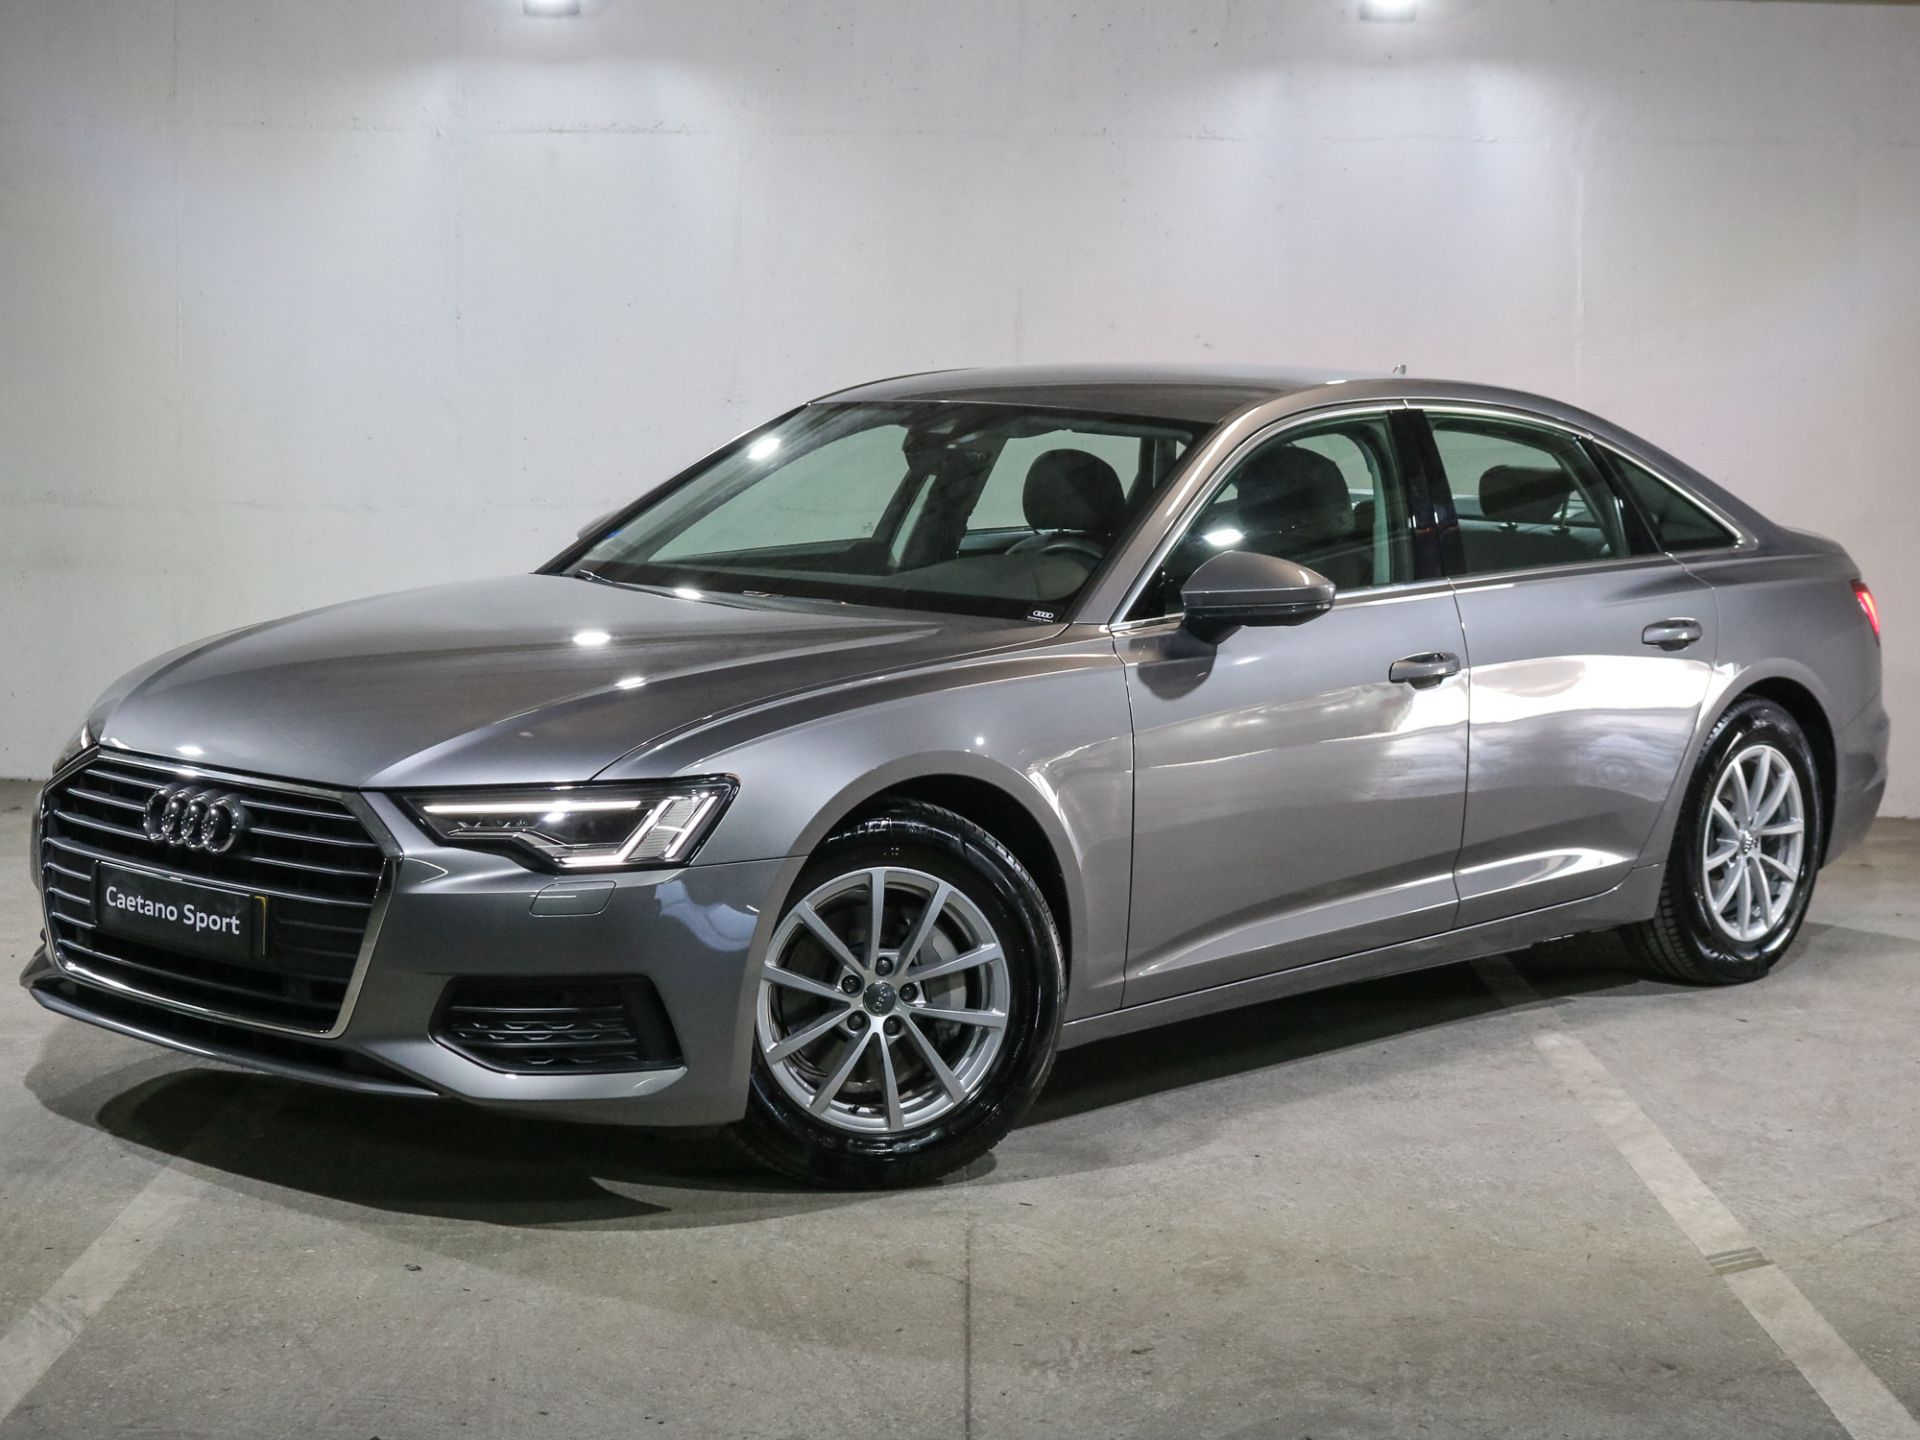 Audi A6 2.0 40 TDI 204cv MHEtronic segunda mão Lisboa